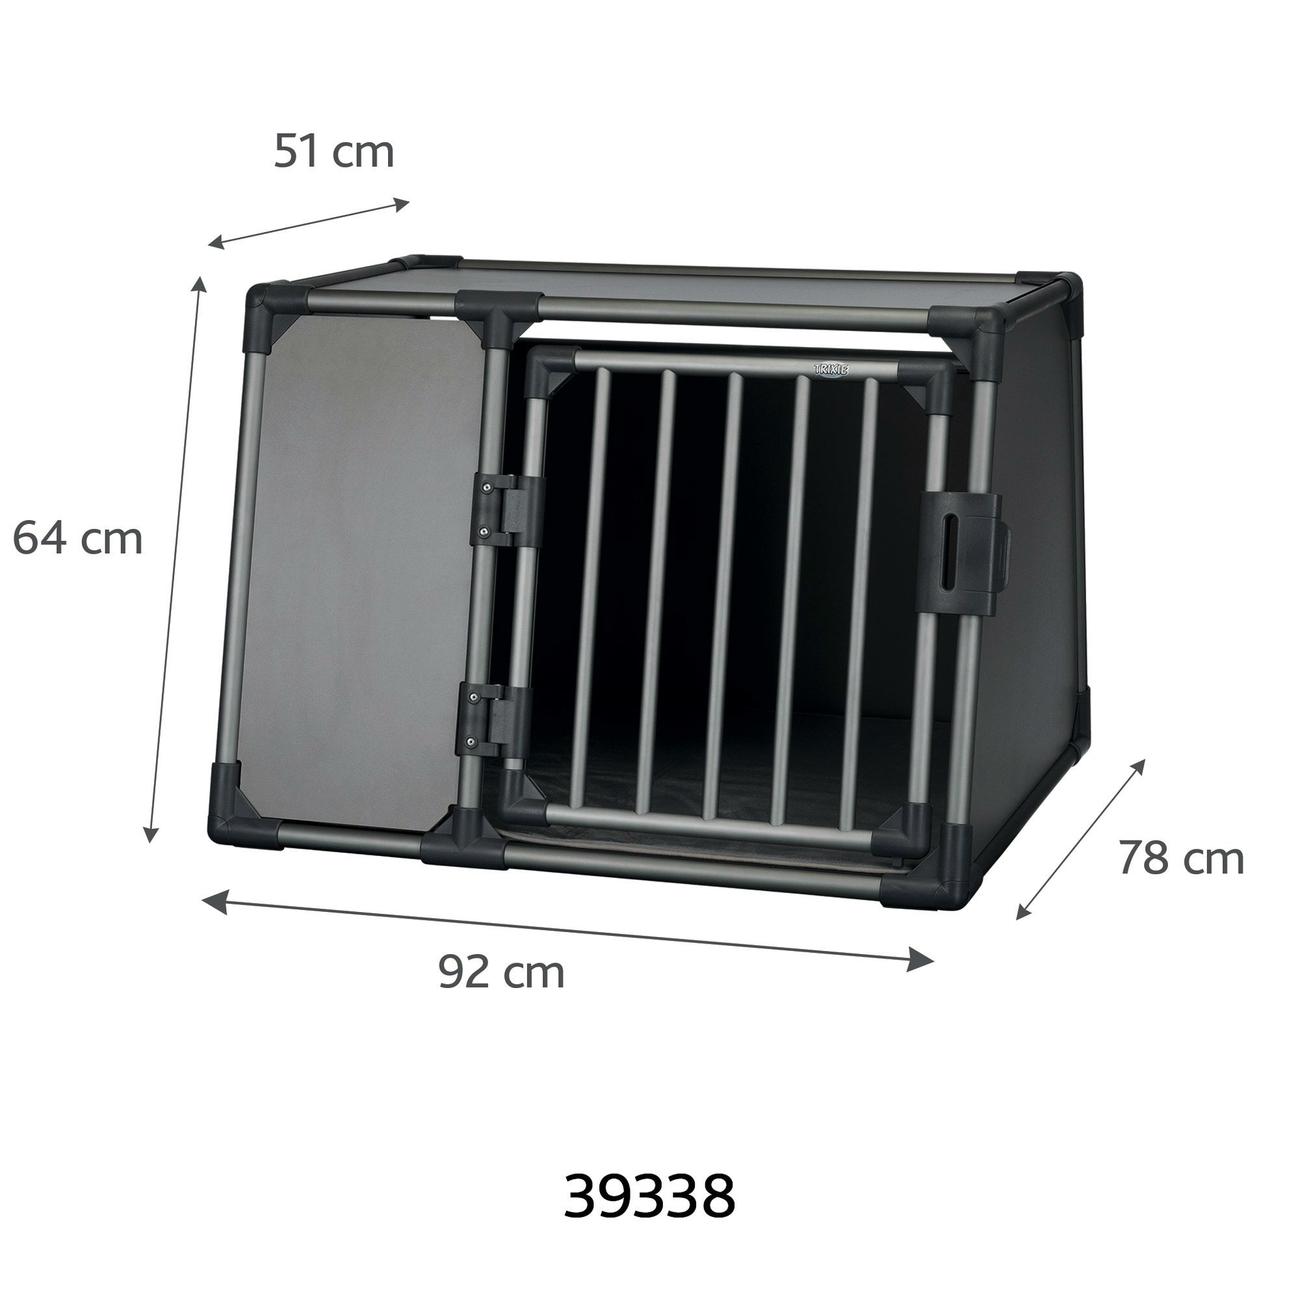 Trixie Autobox für Hunde aus Aluminium, graphit 39335, Bild 8